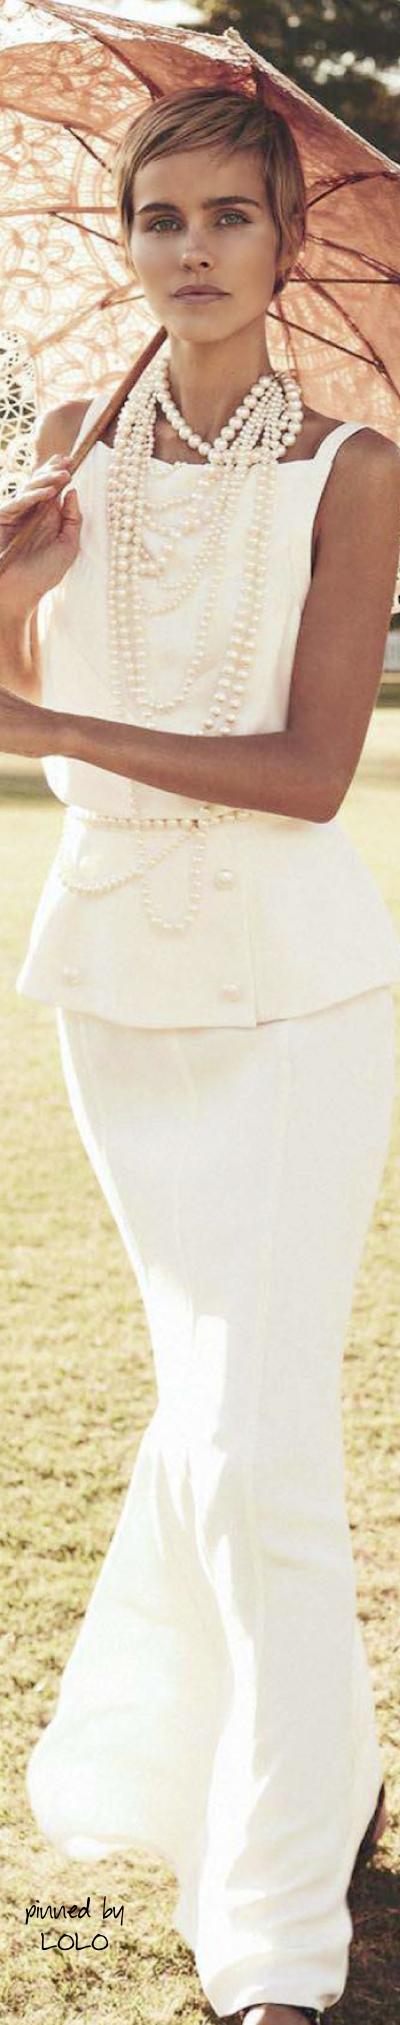 Isabel Lucas in Chanel Resort 2014 for Vogue Australia- ♔LadyLuxury♔